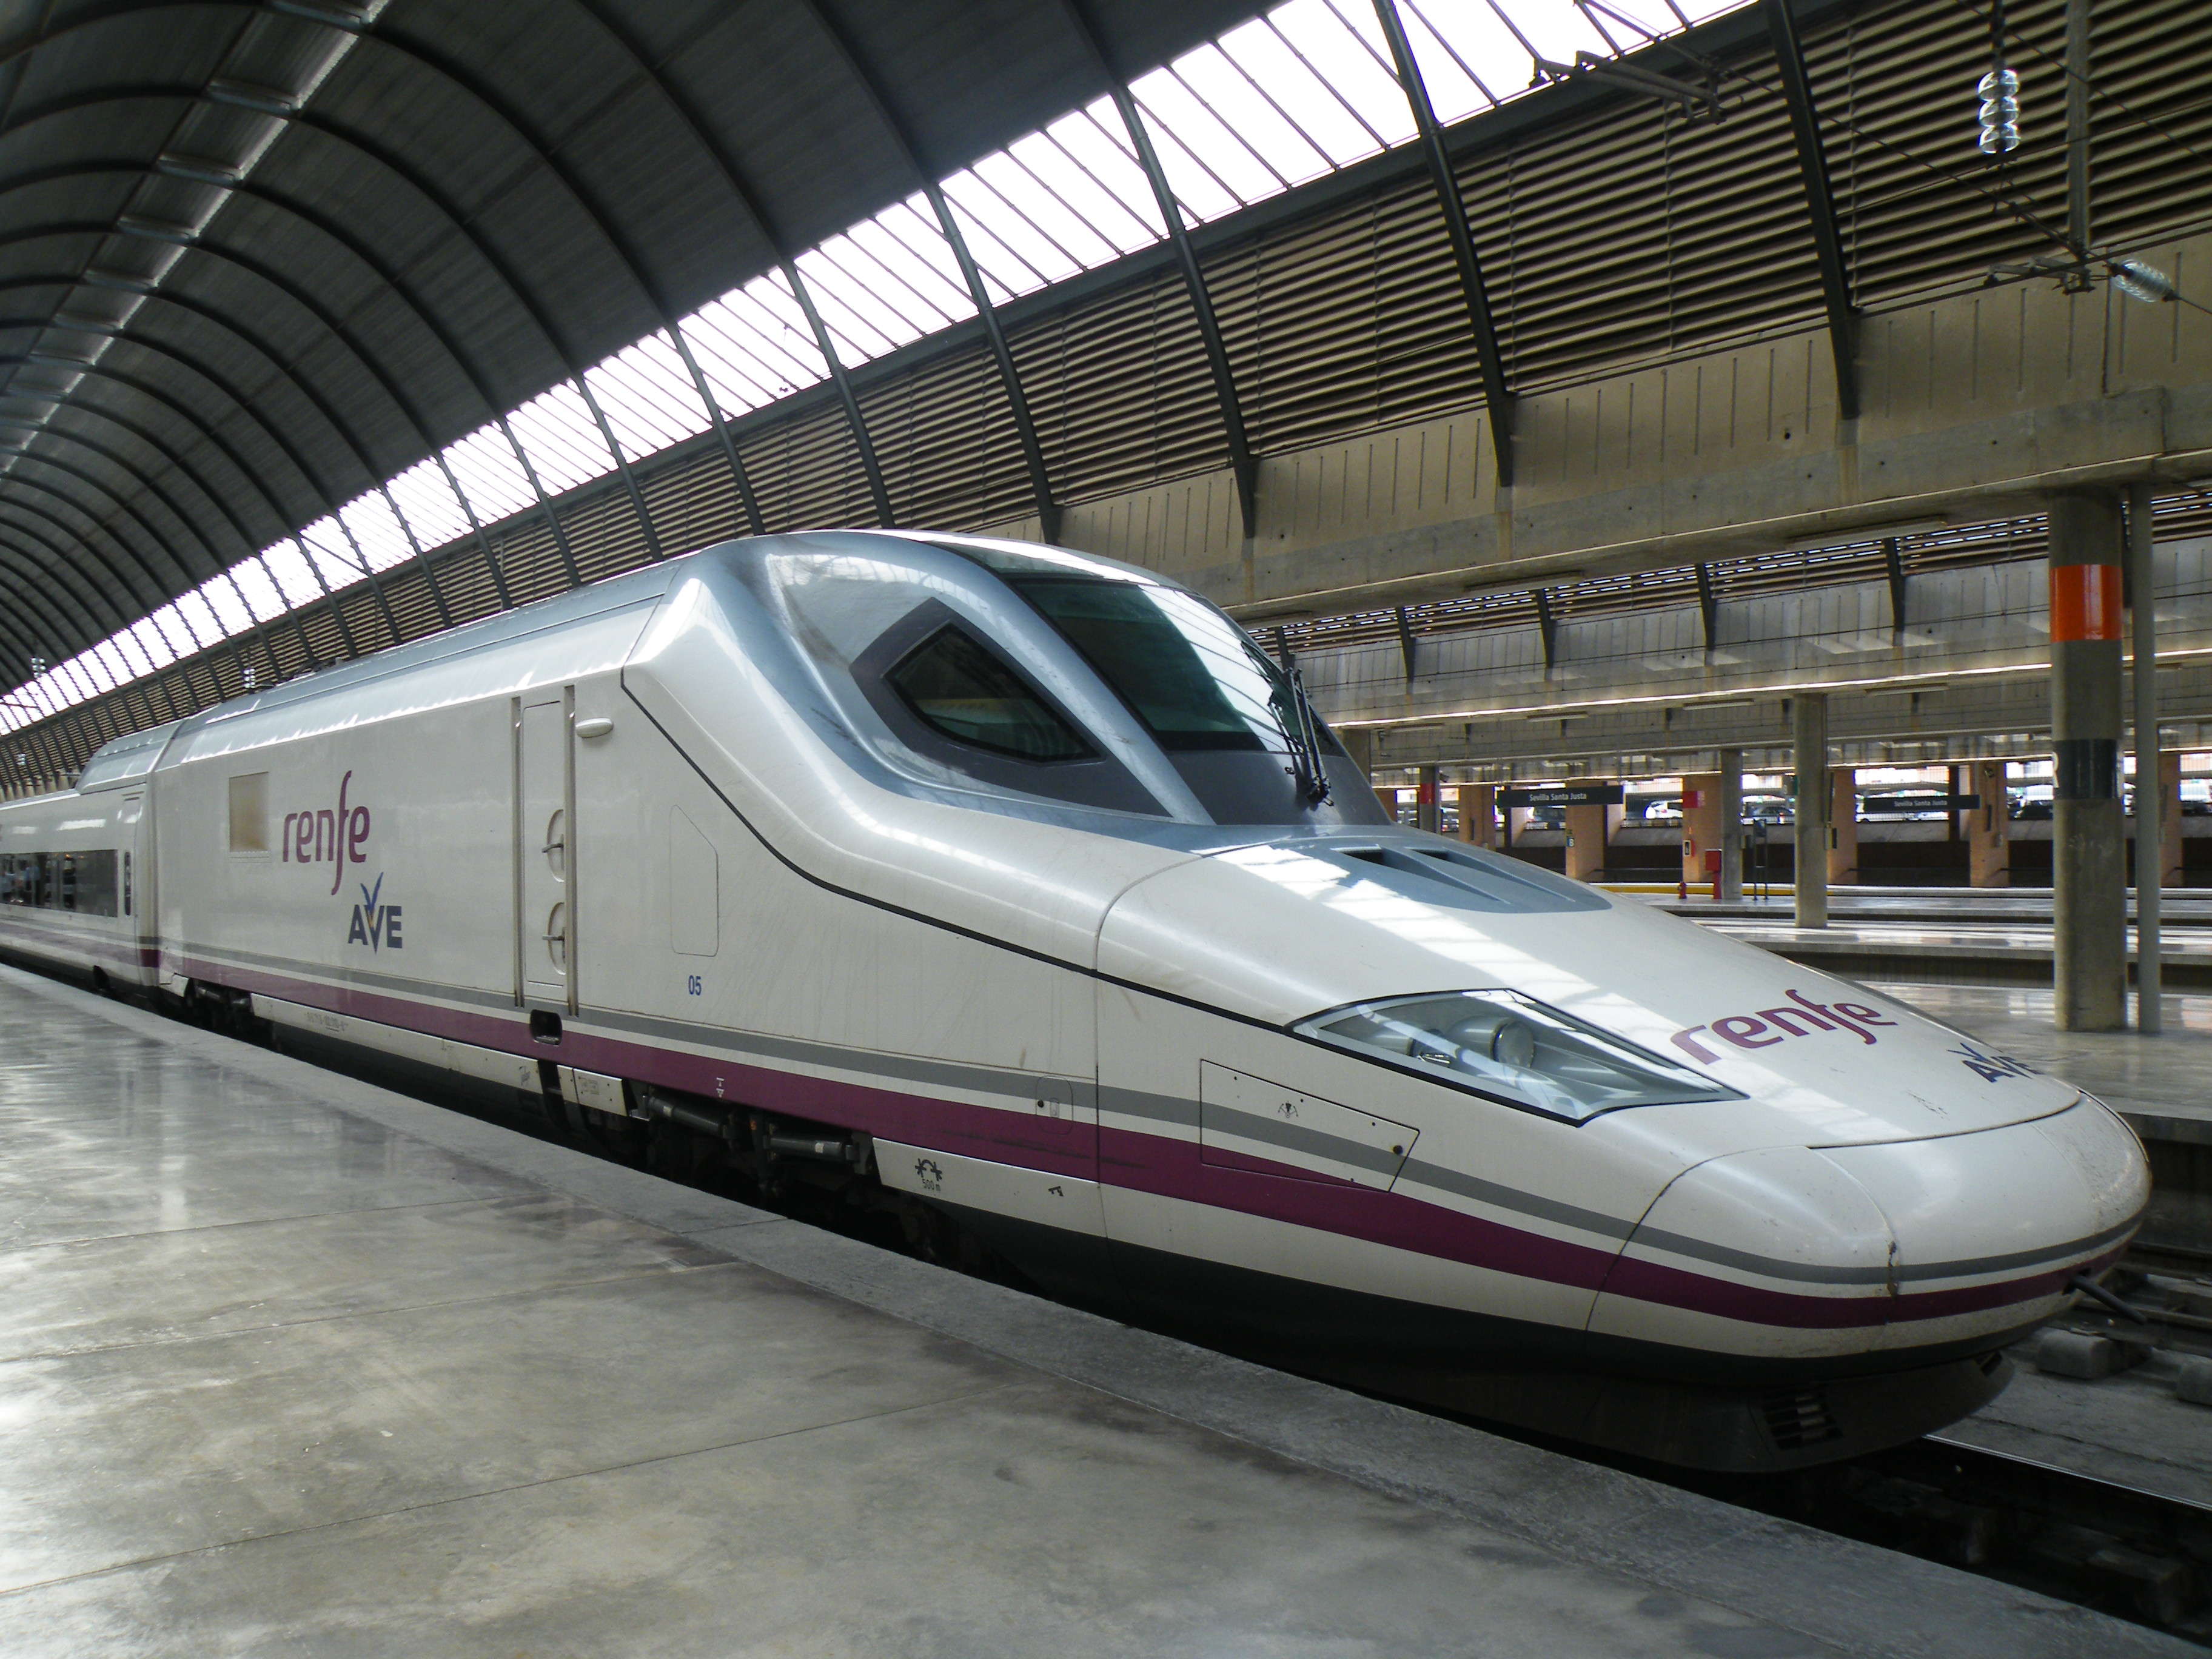 Поезд валенсия аликанте